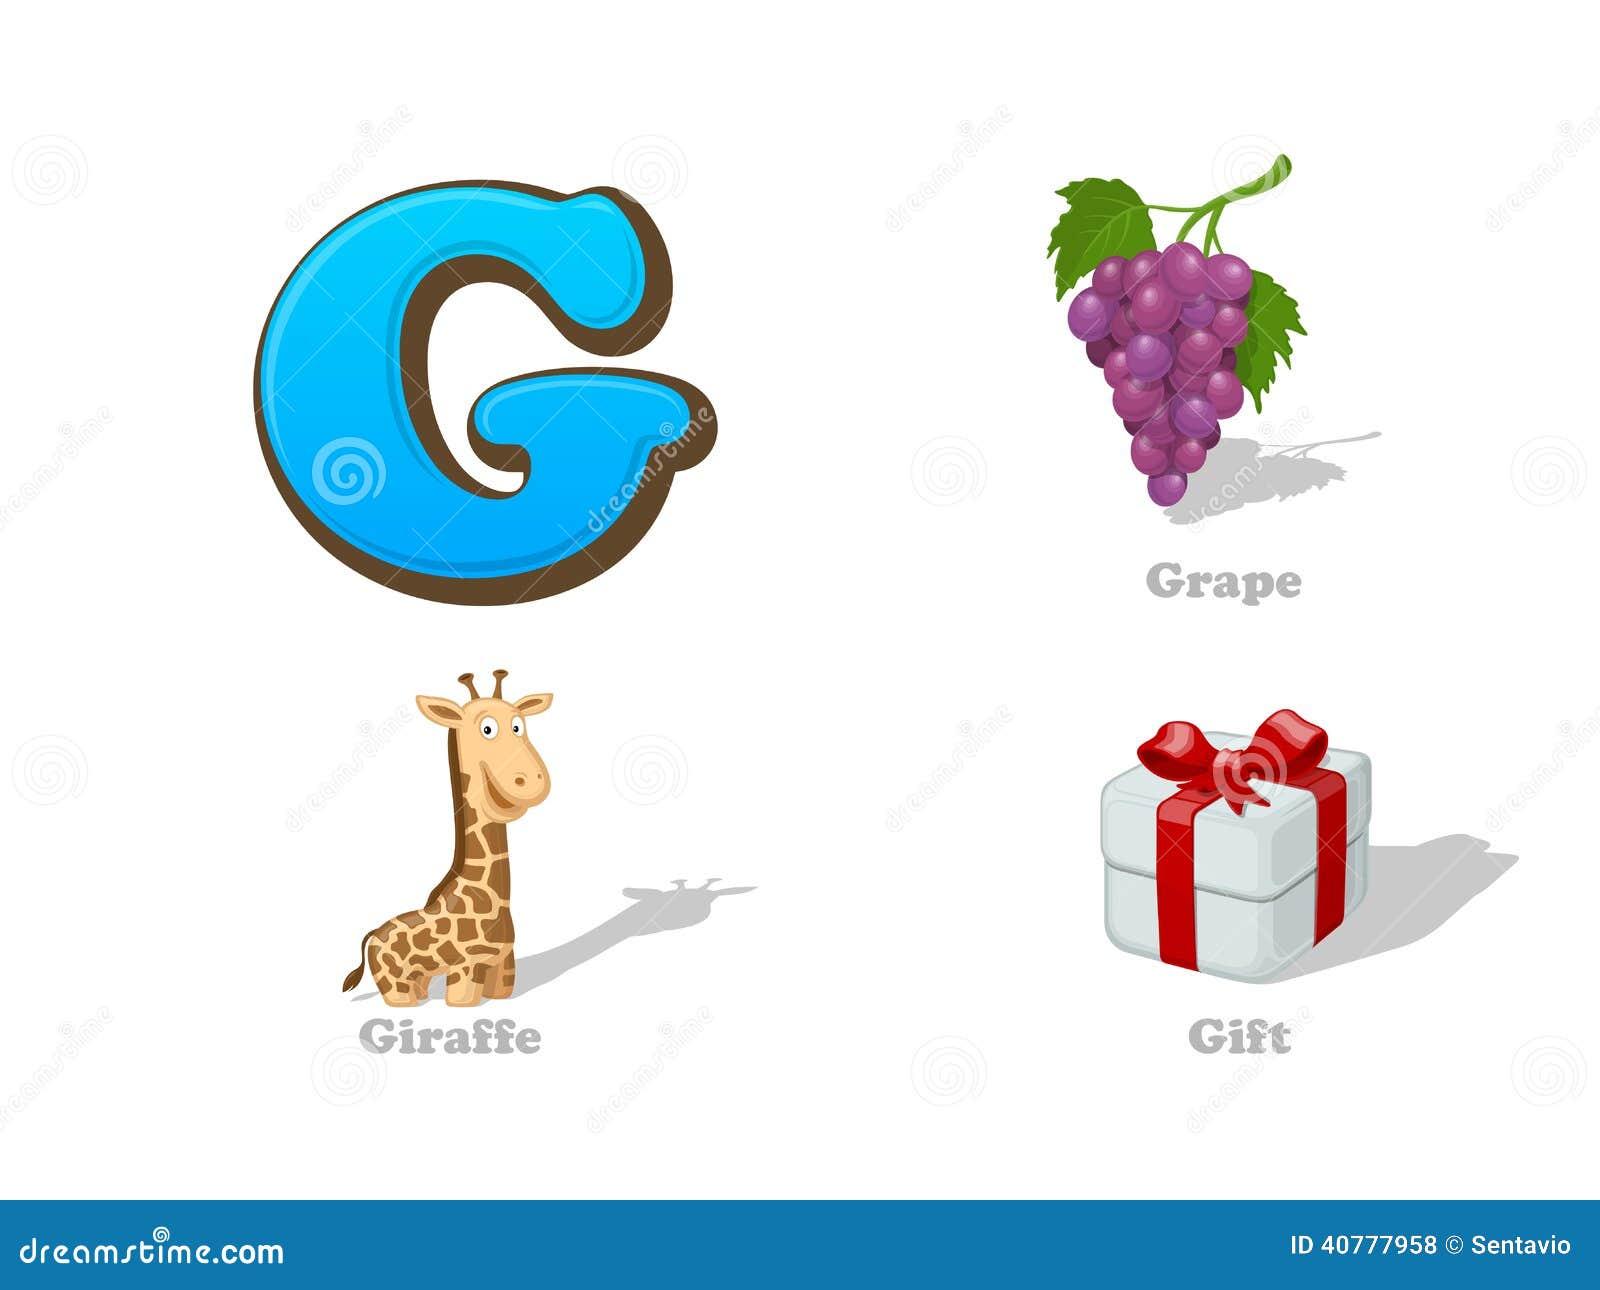 abc letter g funny kid icons set grape  giraffe  gift stock vector image 40777958 horse clip art images free horse clip art images free